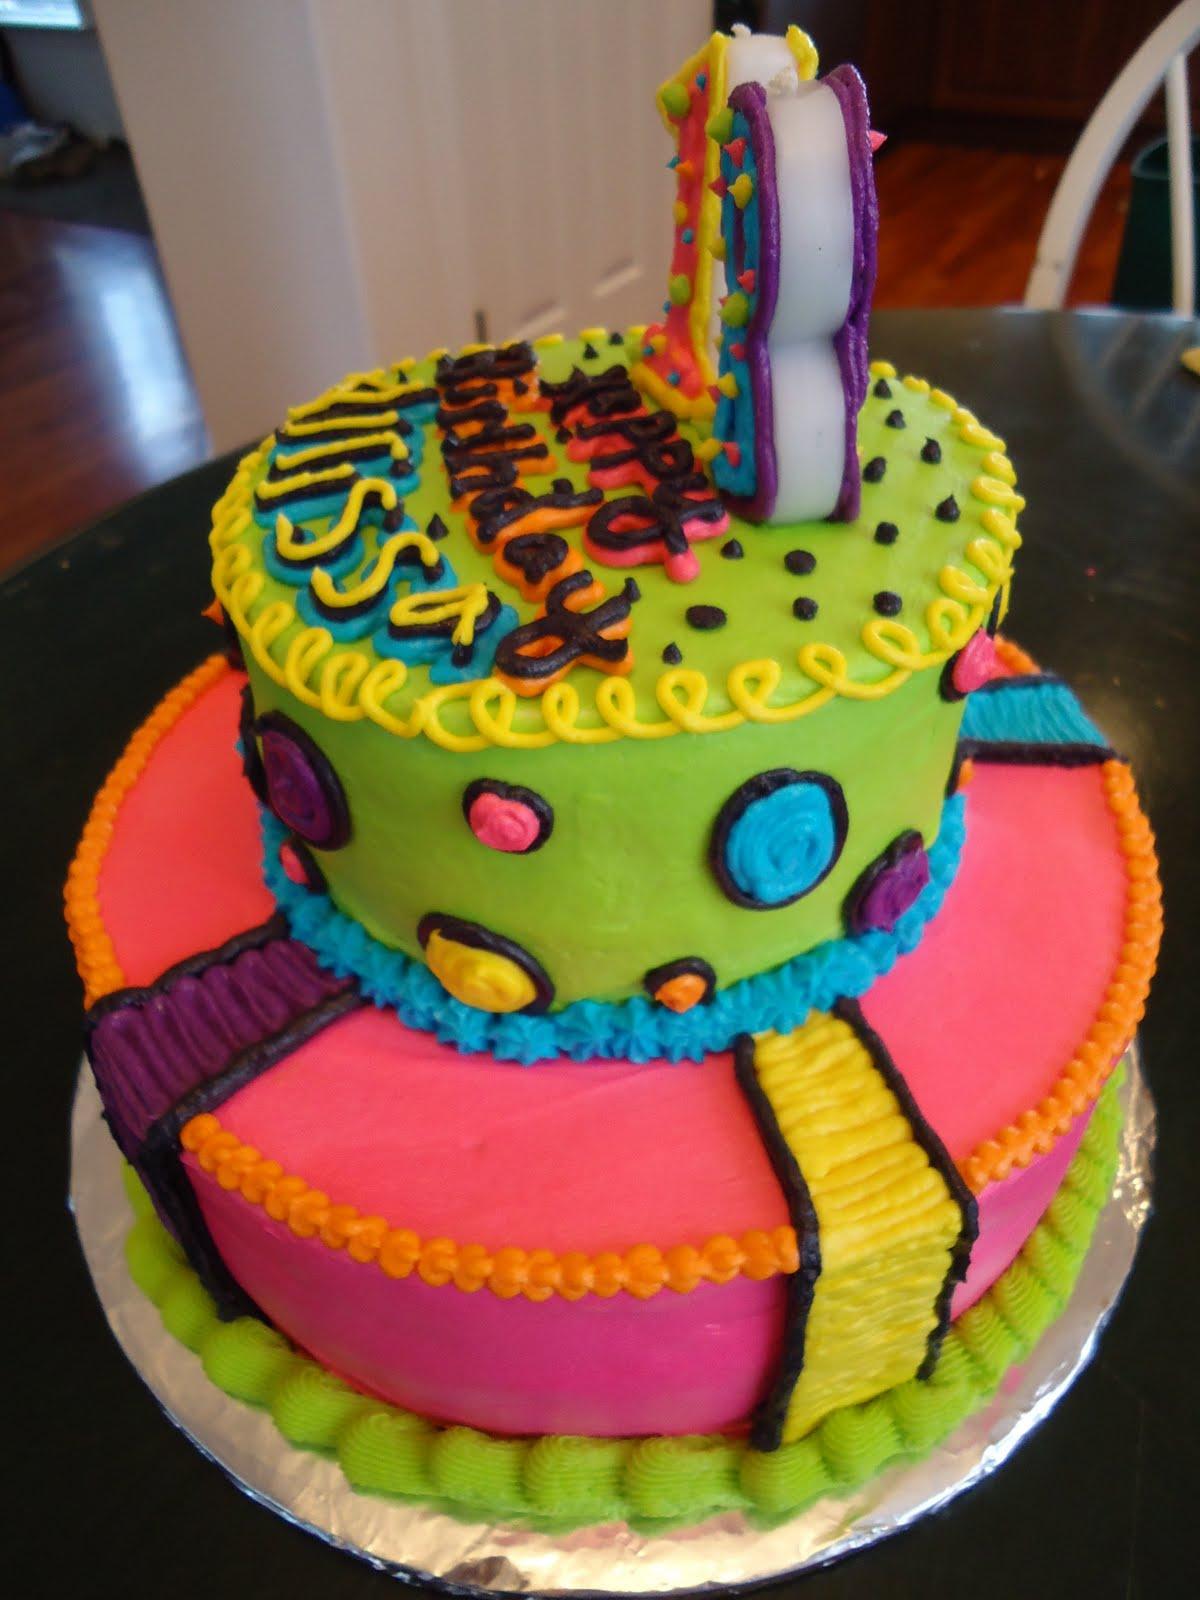 Cats Cake Creations Neon Lights Bright Bright Bright Birthday Cake